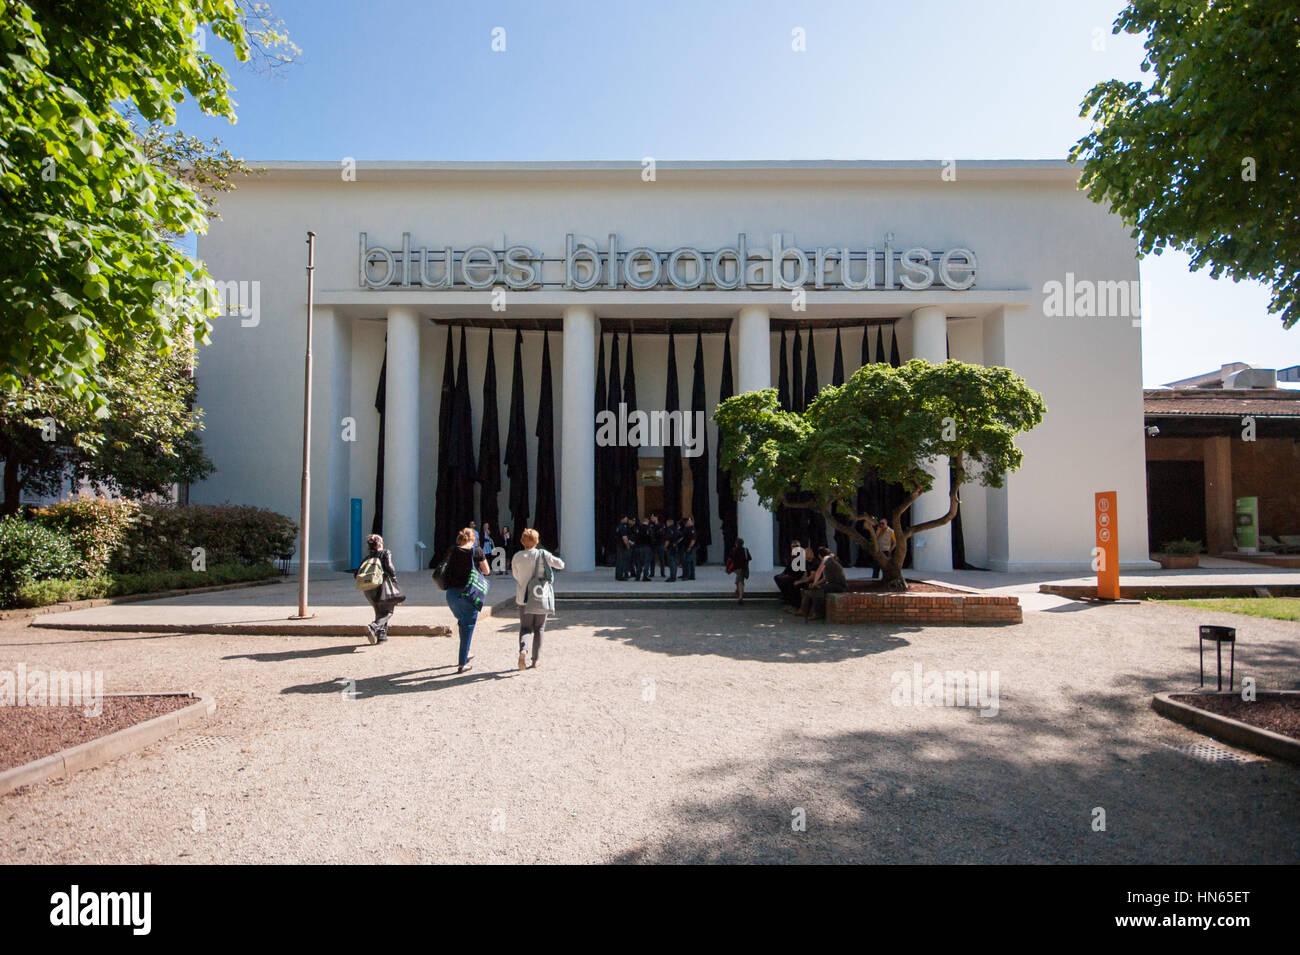 Venice Art Biennale 2015, central pavilion Giardini, curator: Okwui Enwezor - Stock Image